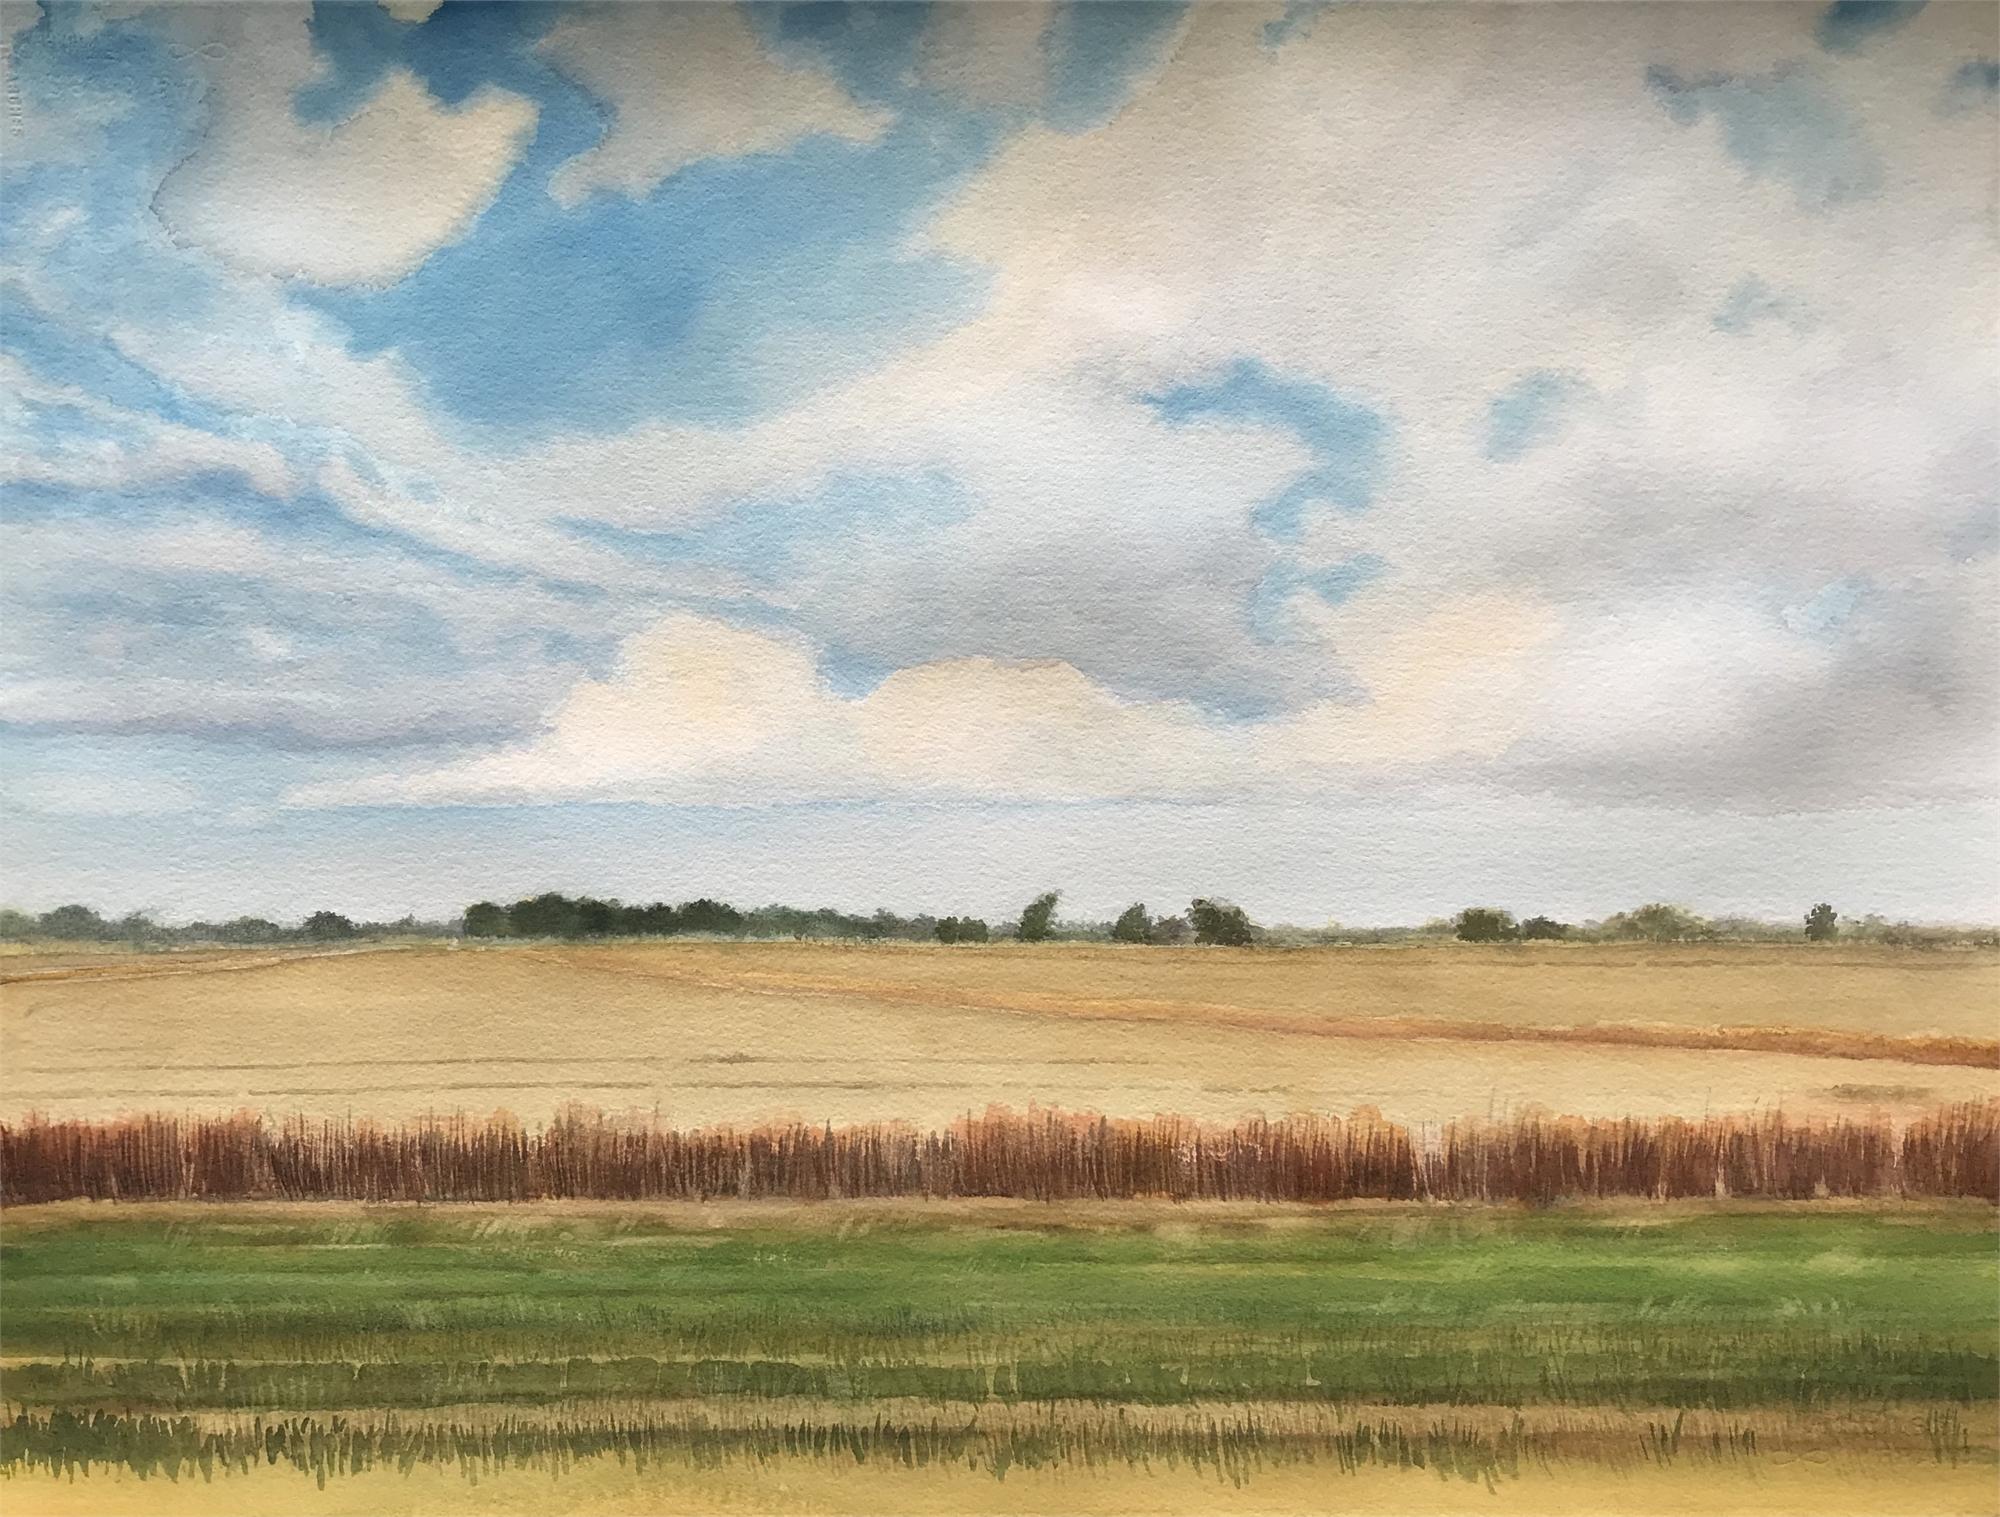 Chambers County #4 by Ken Mazzu